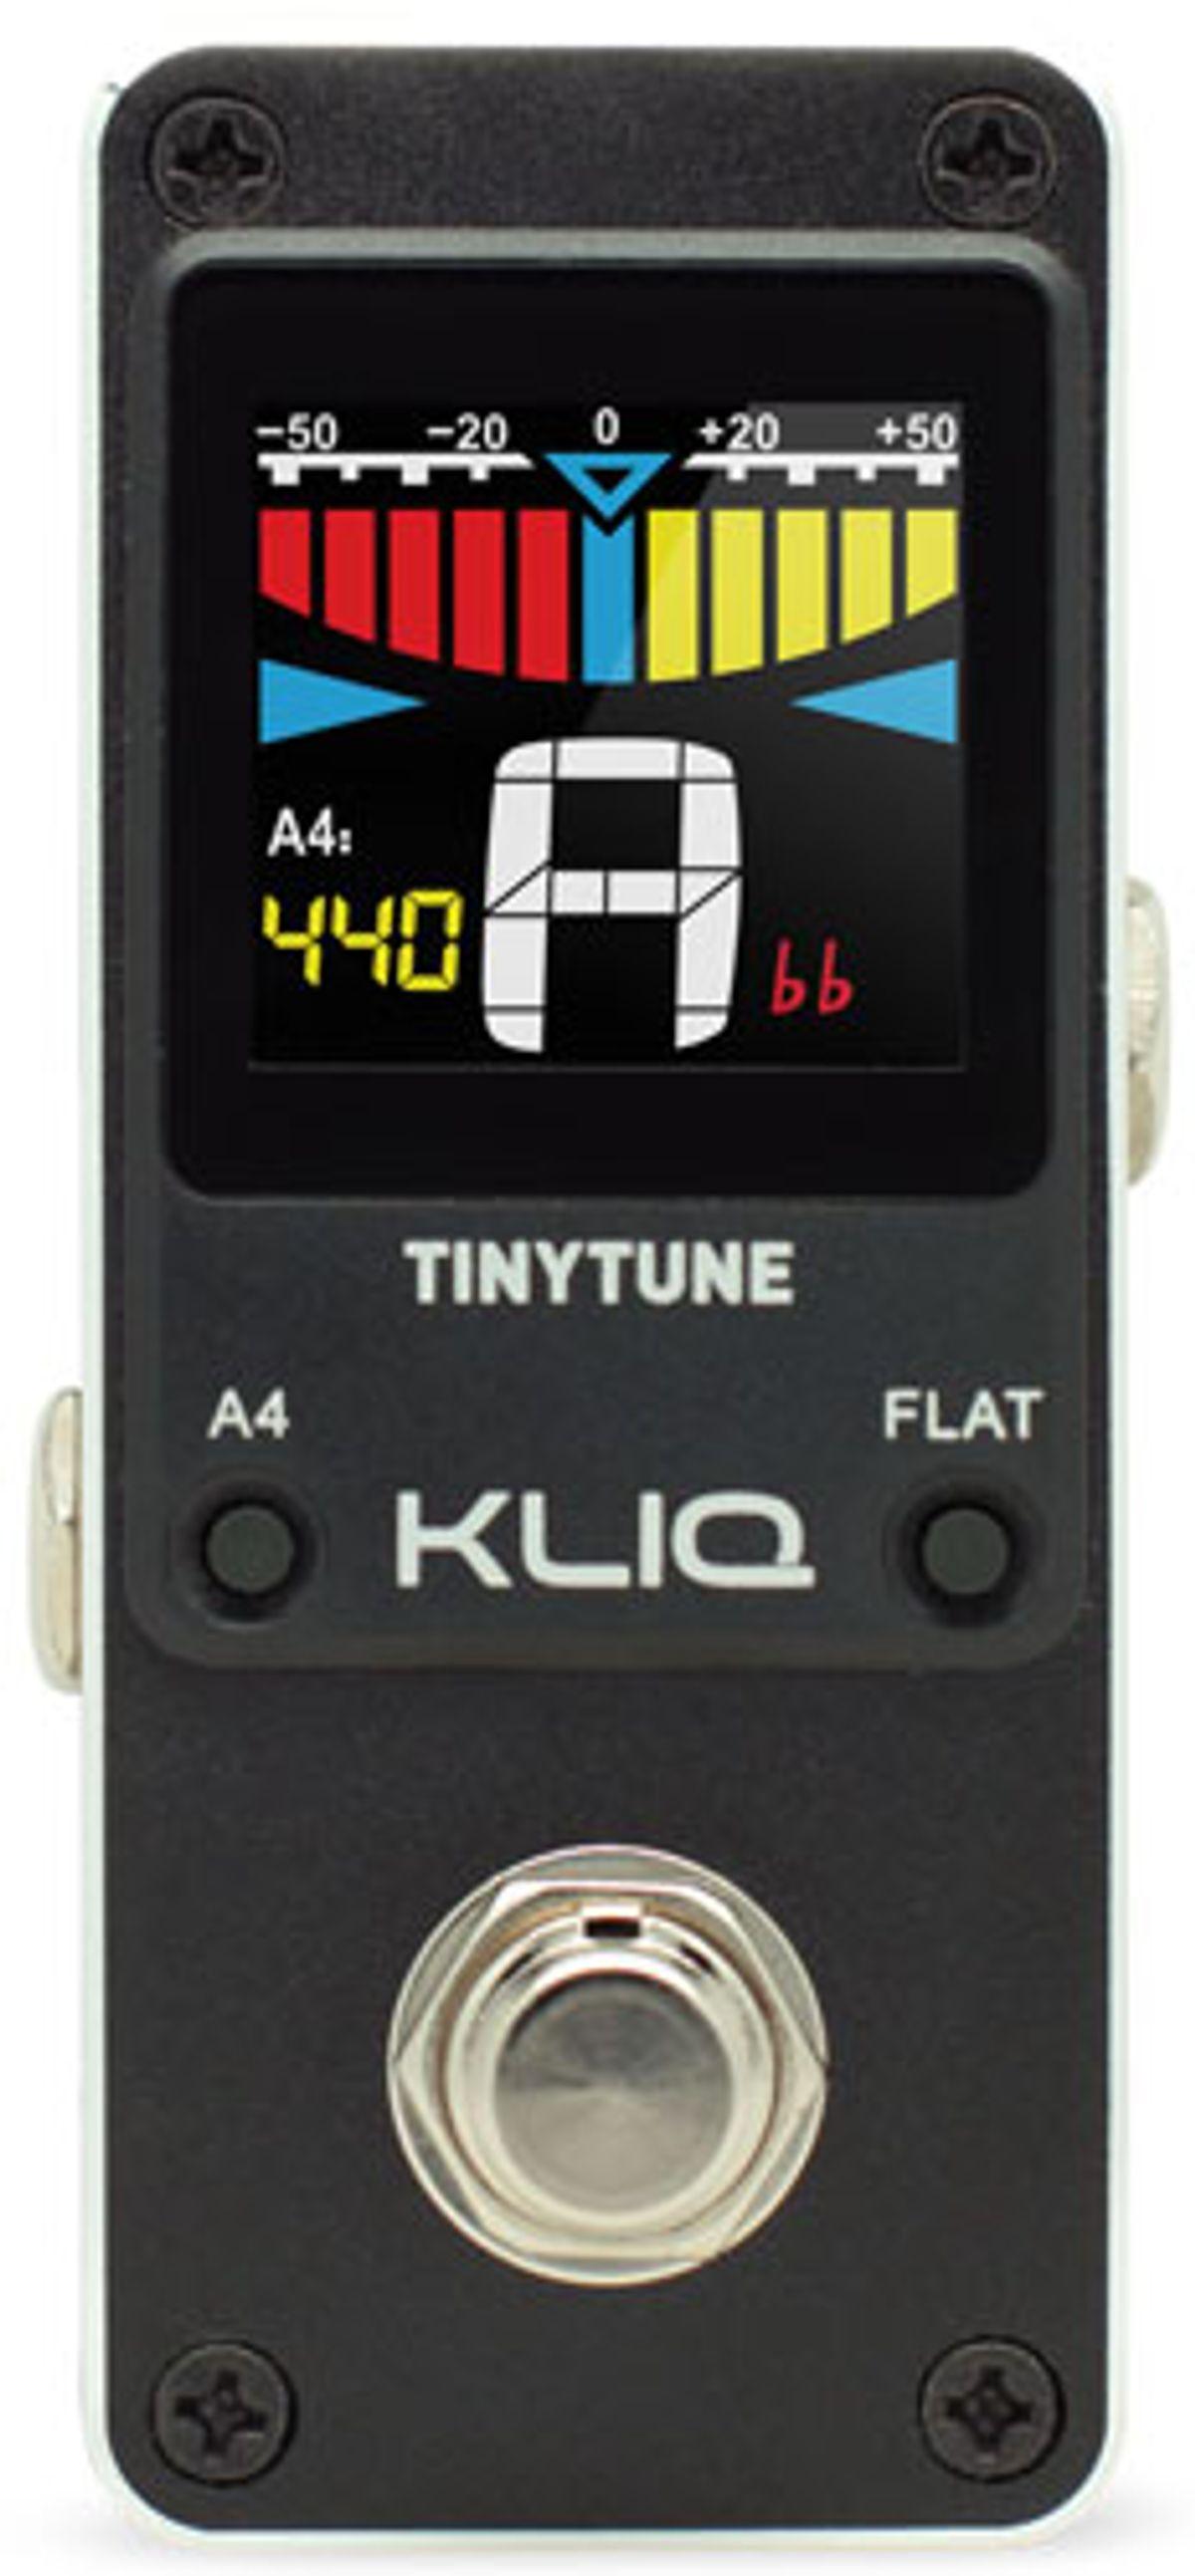 Kliq Announces the TinyTune